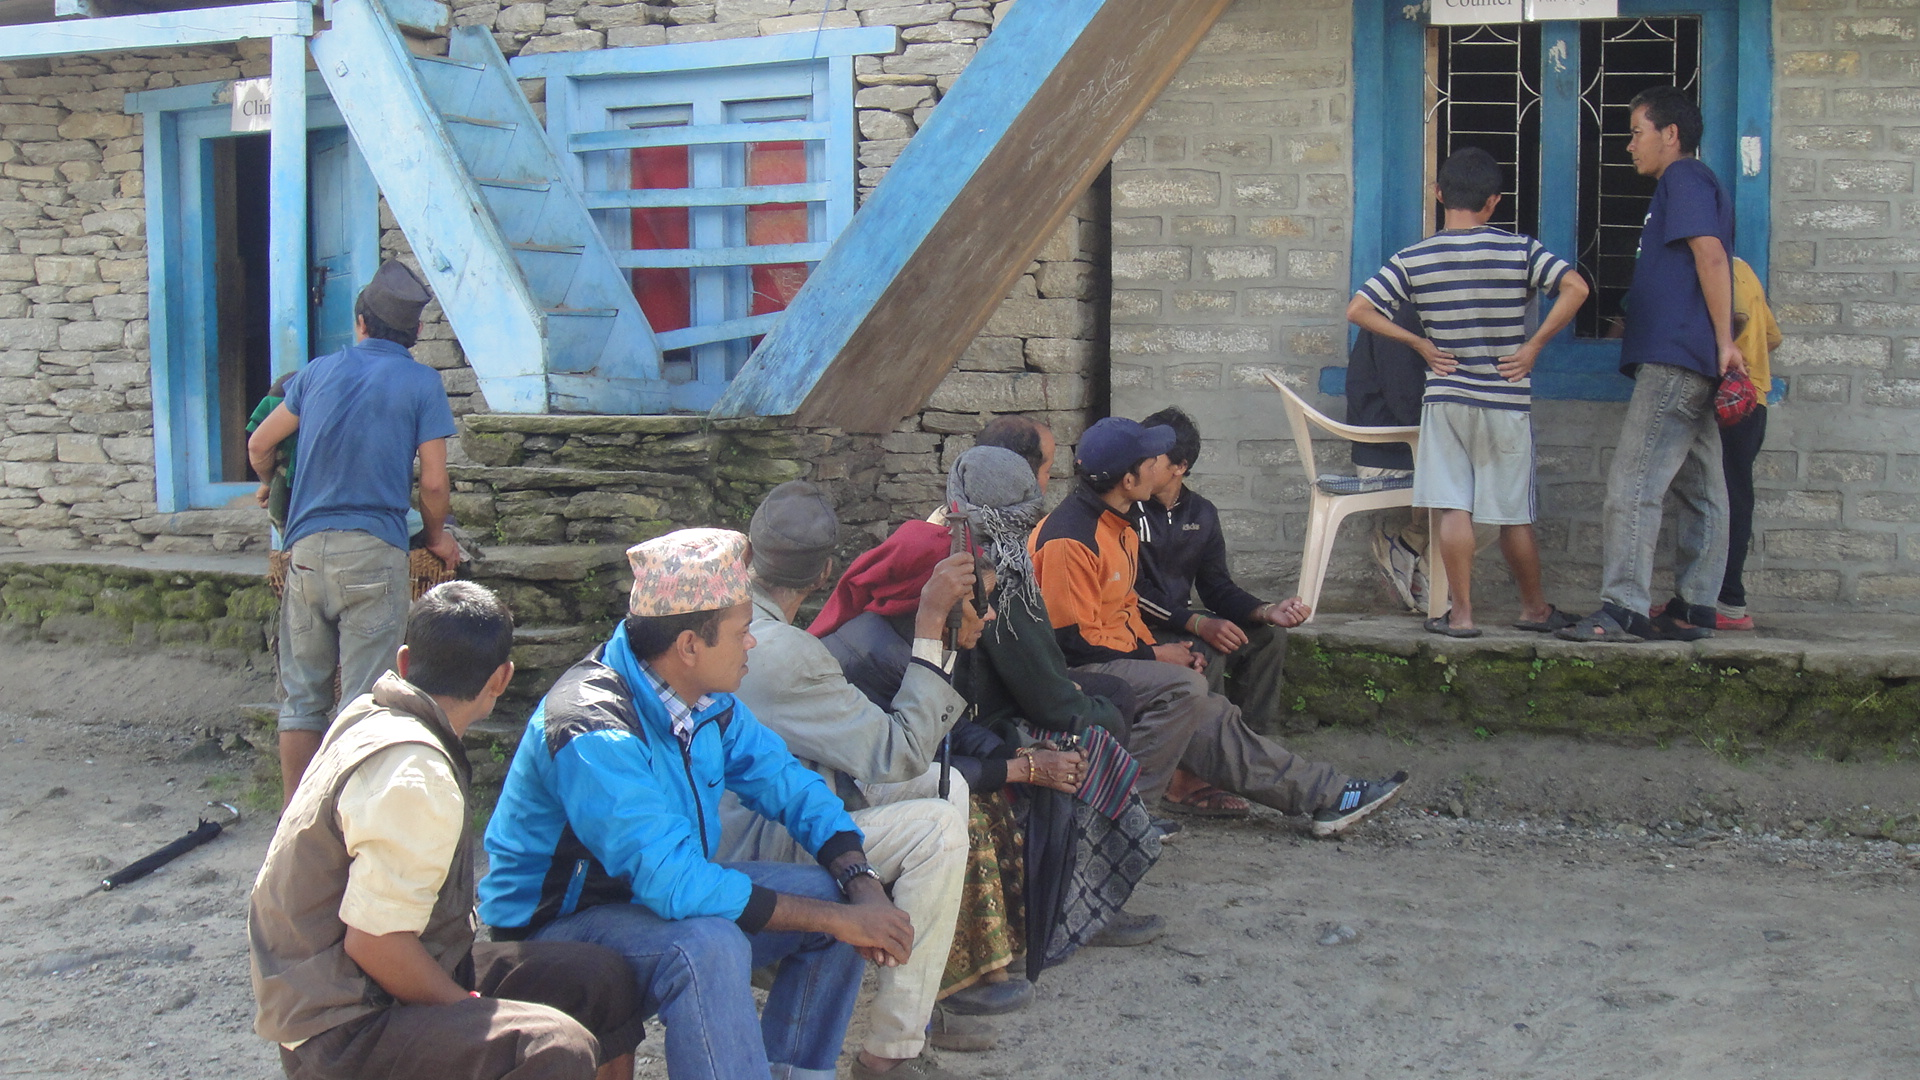 Village_Volunteer_Students_Medical_University_Adventure_Alternative_Nepal.JPG